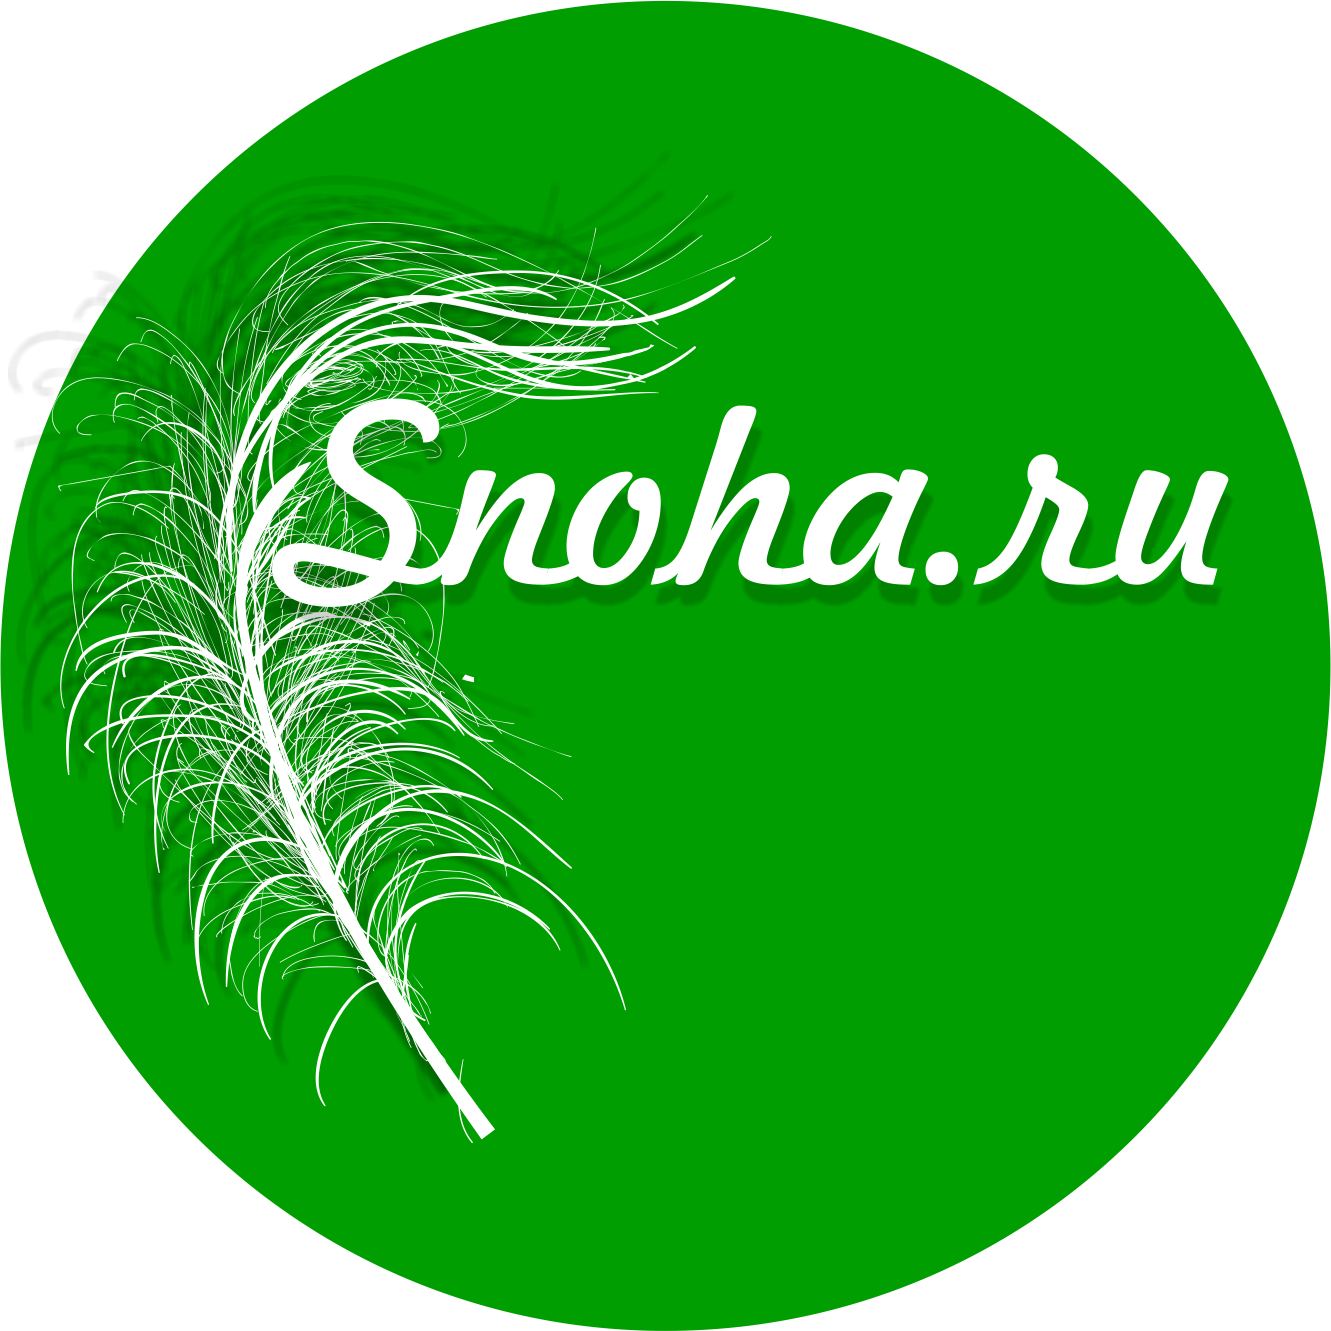 Логотип клининговой компании, сайт snoha.ru фото f_36554a96e954560b.png